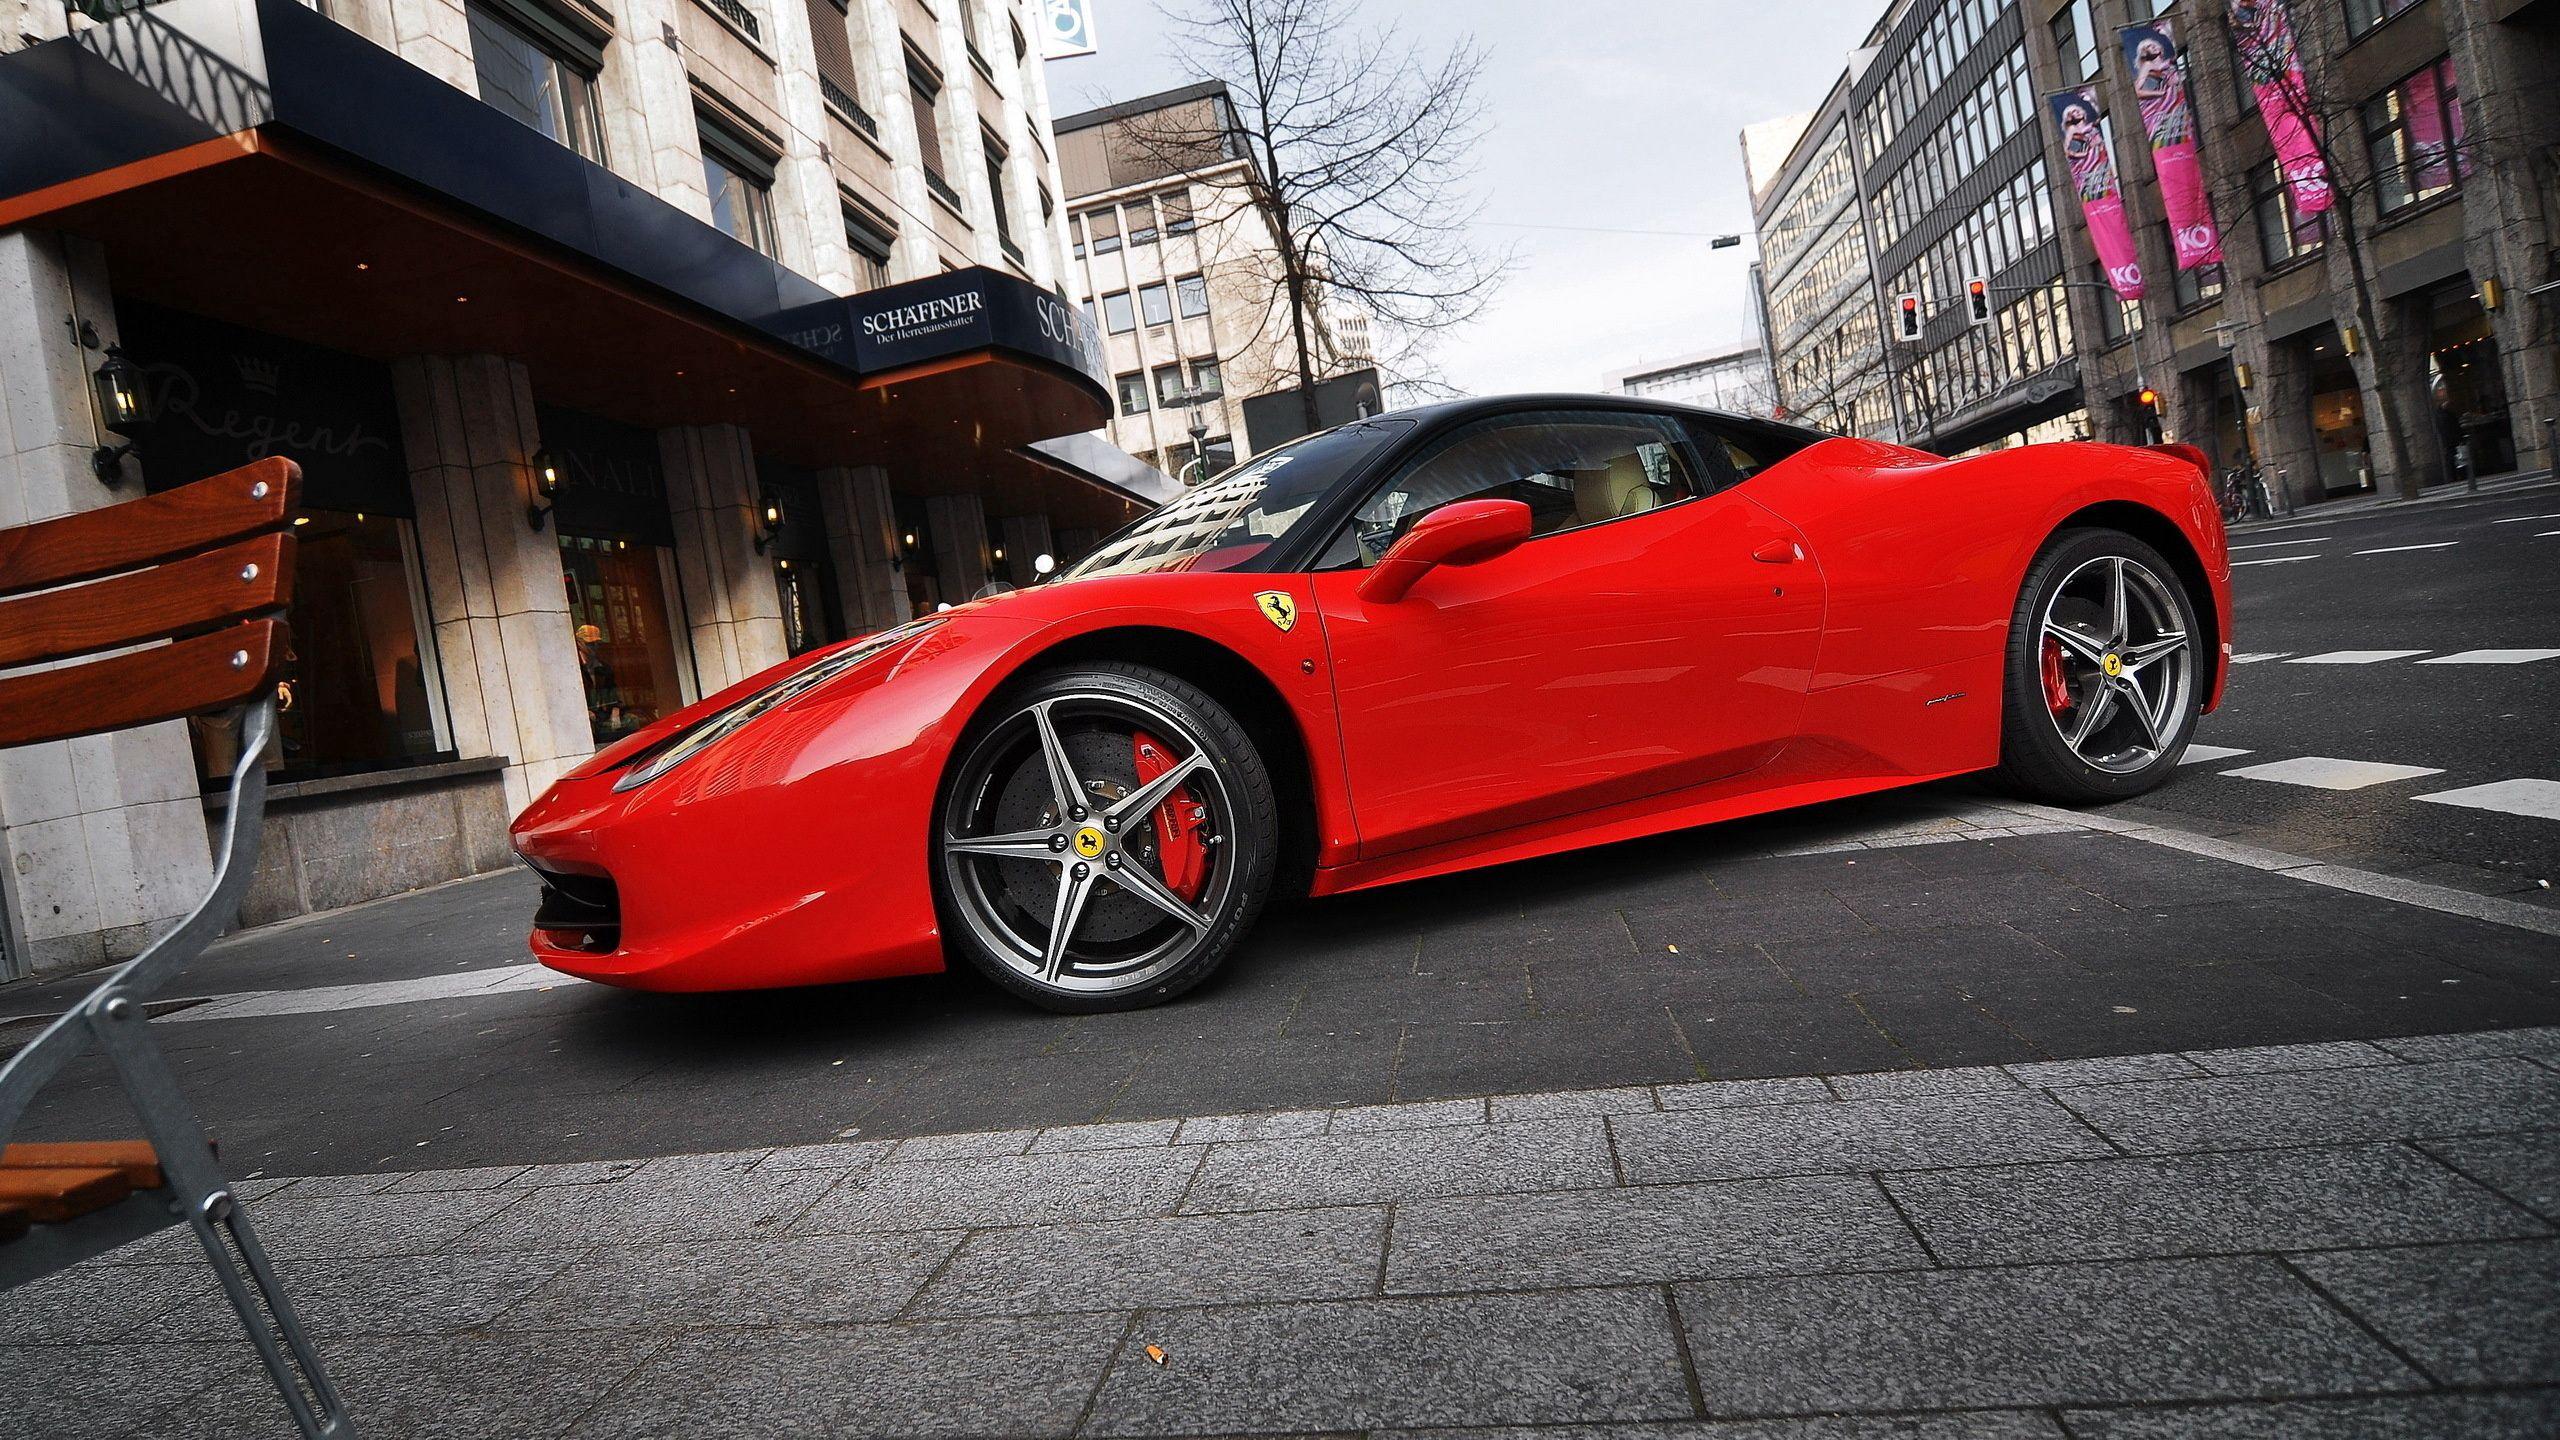 126918 скачать обои Улица, Феррари (Ferrari), Тачки (Cars), Парковка, Красная, Ferrari 458 Italia - заставки и картинки бесплатно